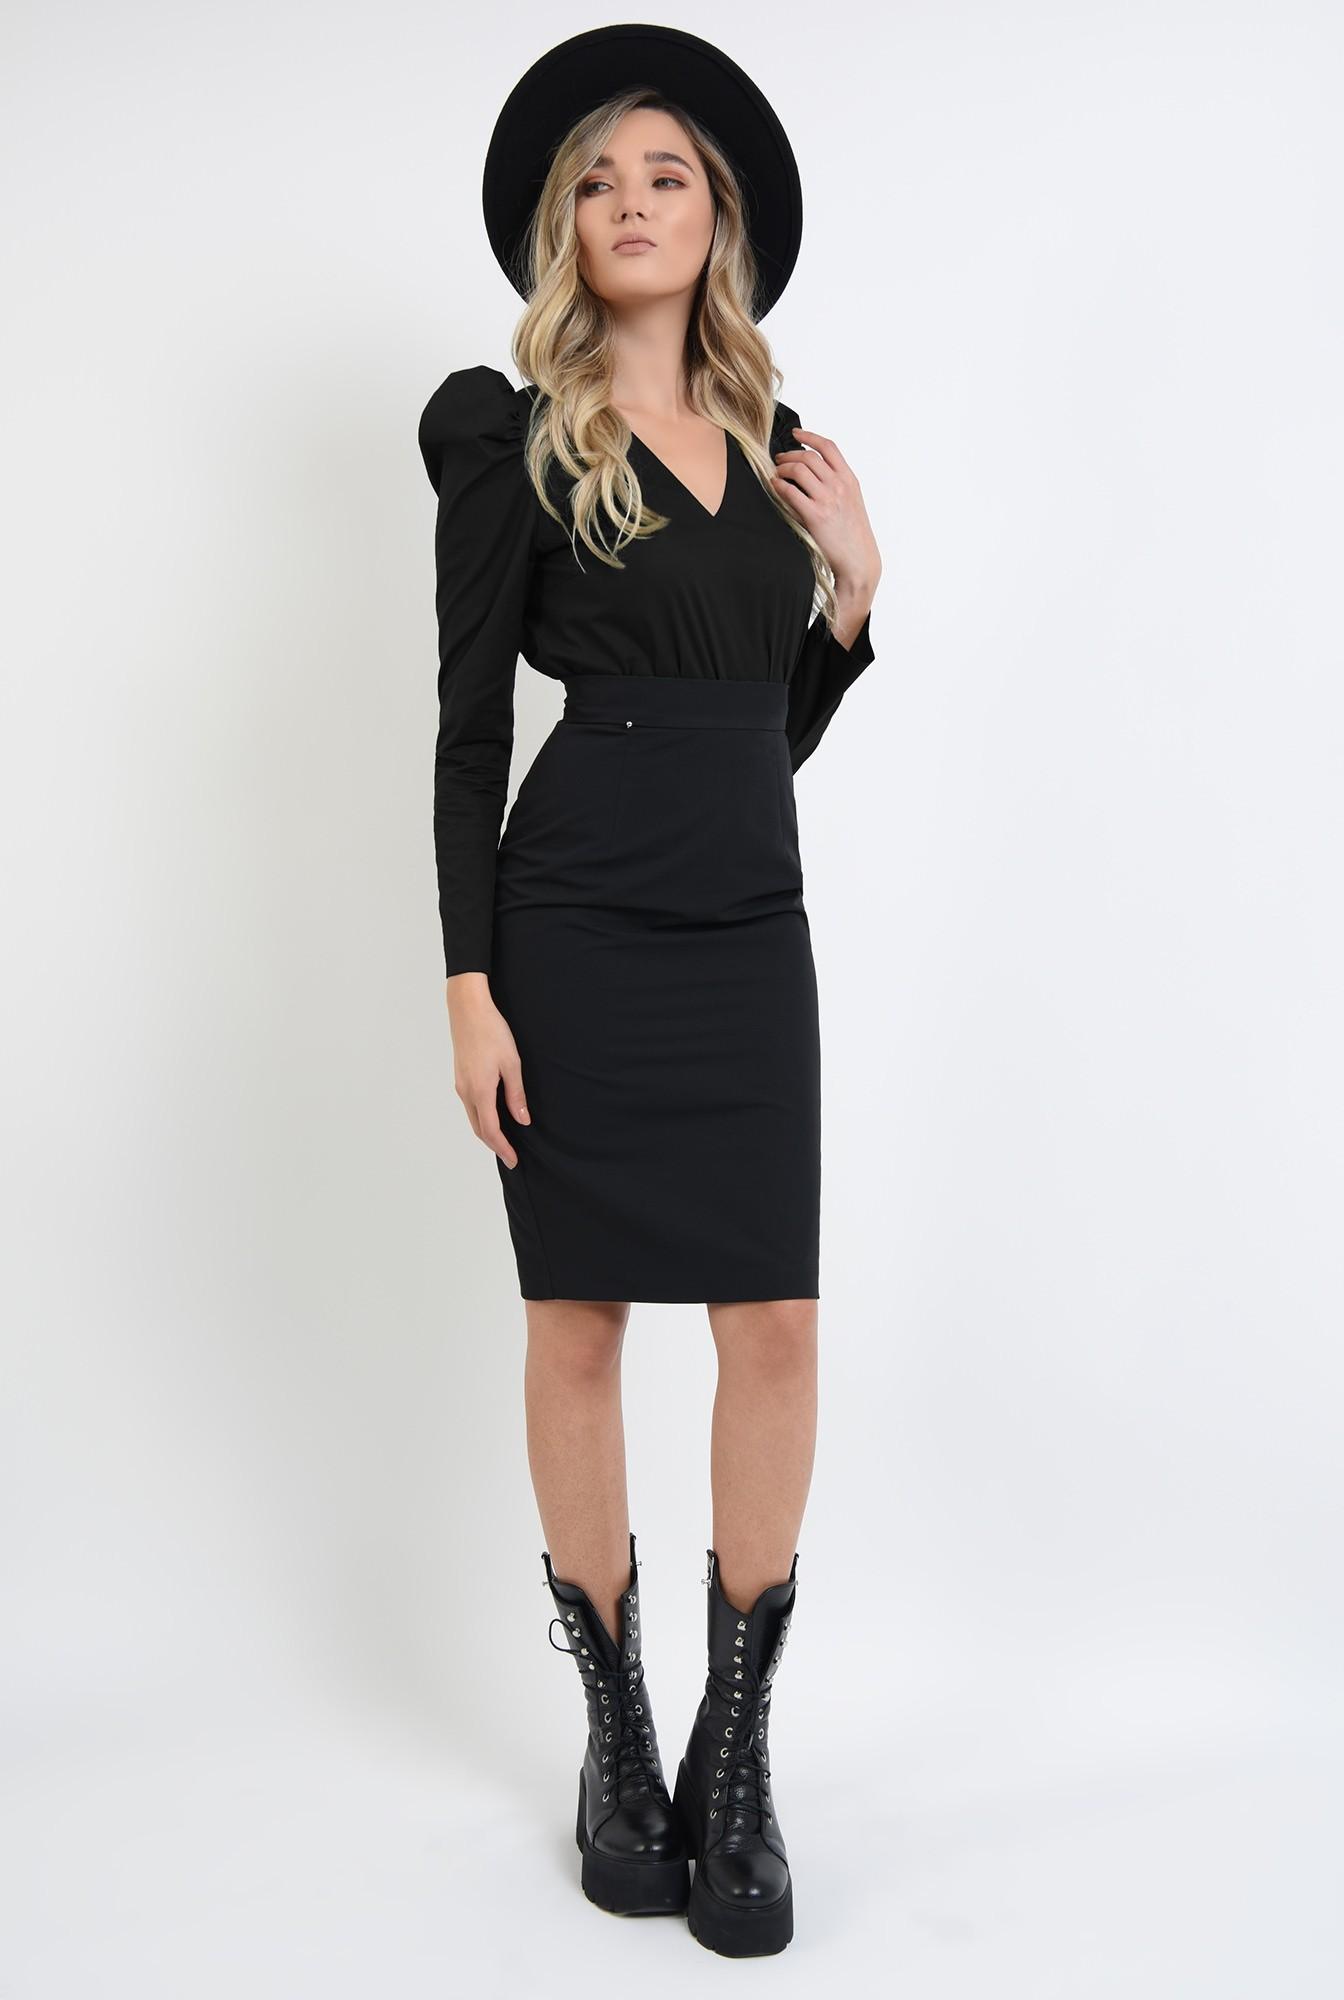 0 - bluza neagra, cu umeri accentuati, cu maneca lunga